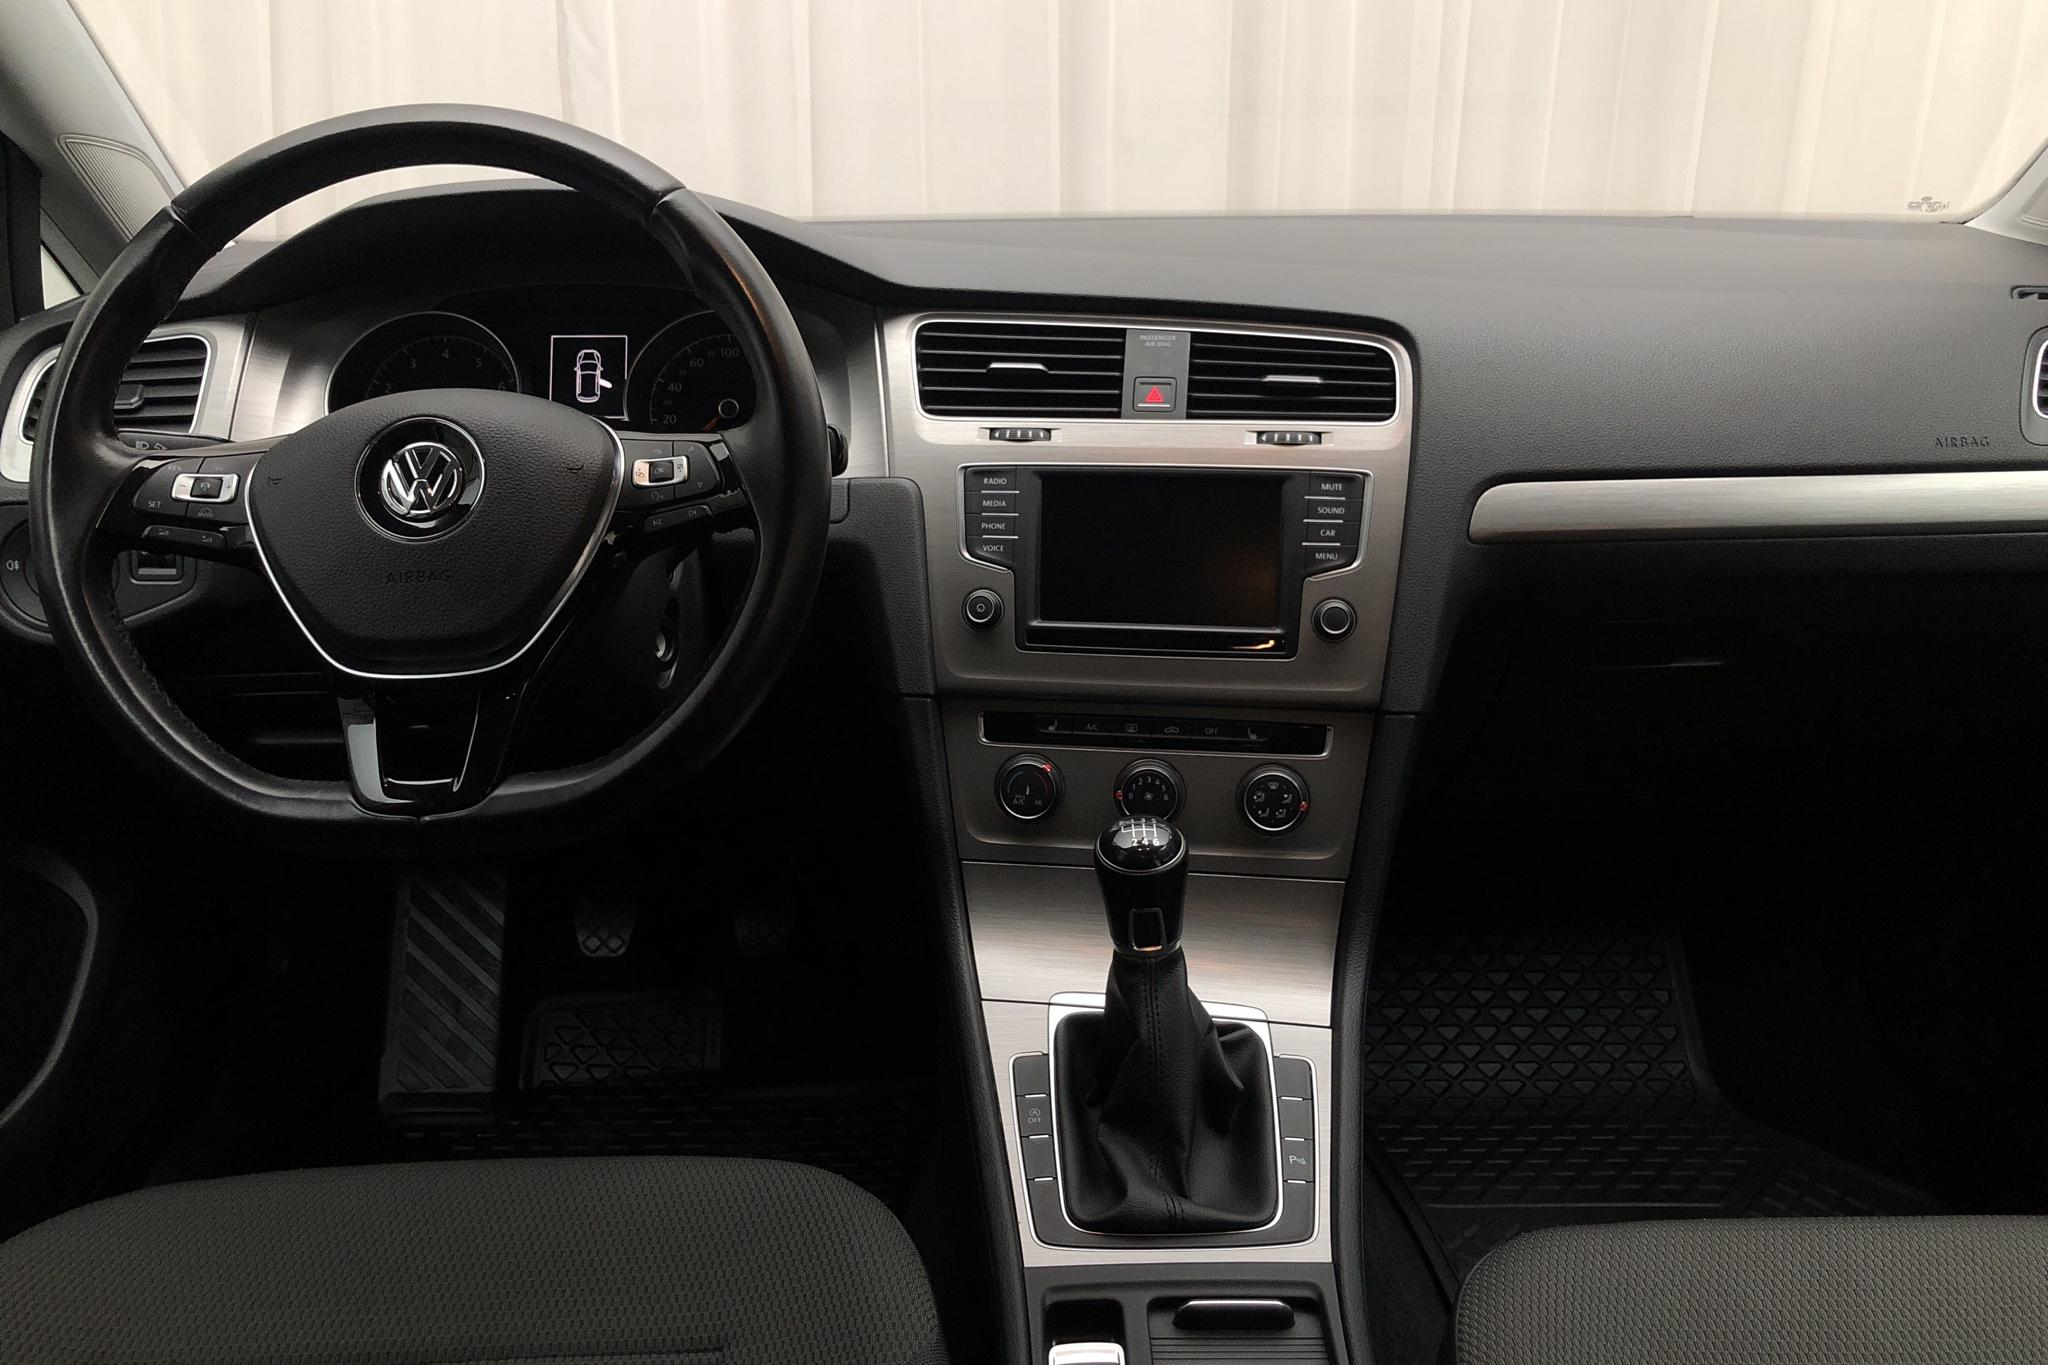 VW Golf VII 1.2 TSI 5dr (110hk) - 54 630 km - Manual - black - 2017